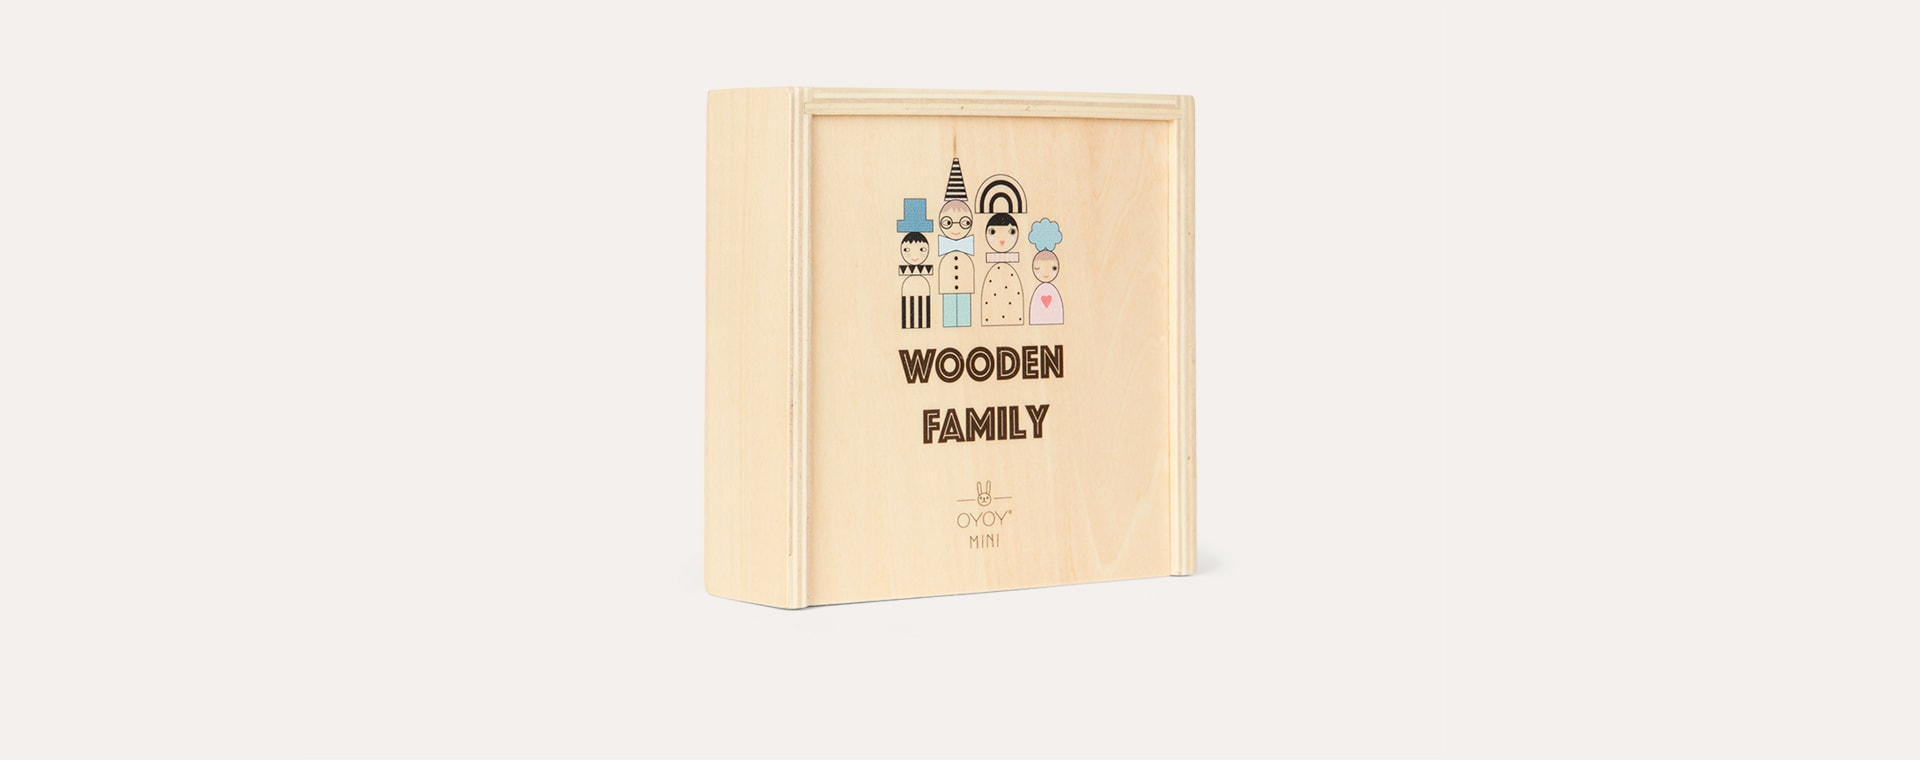 Neutral OYOY Wooden Family Bricks